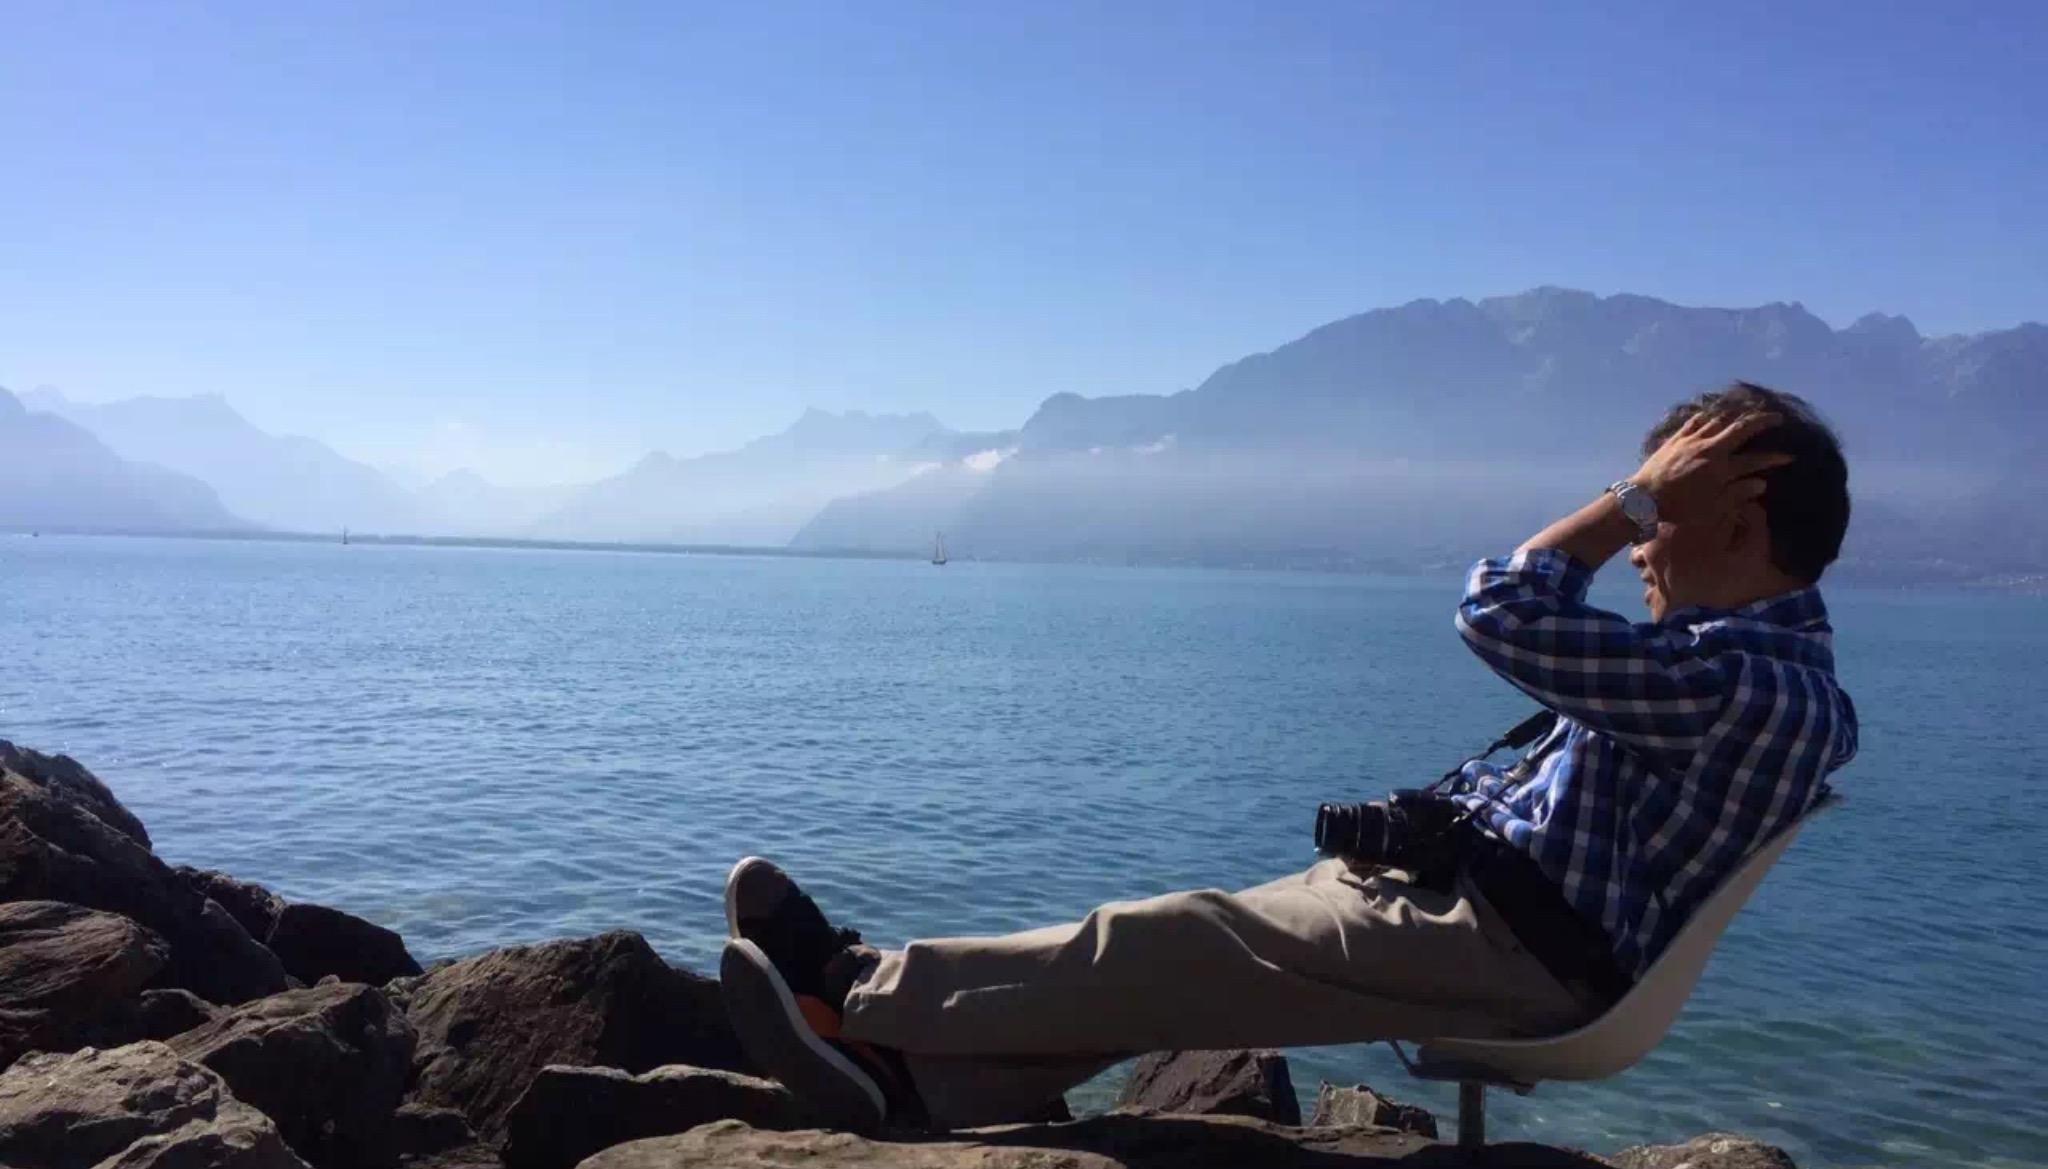 日內瓦湖畔Lake Geneva 。